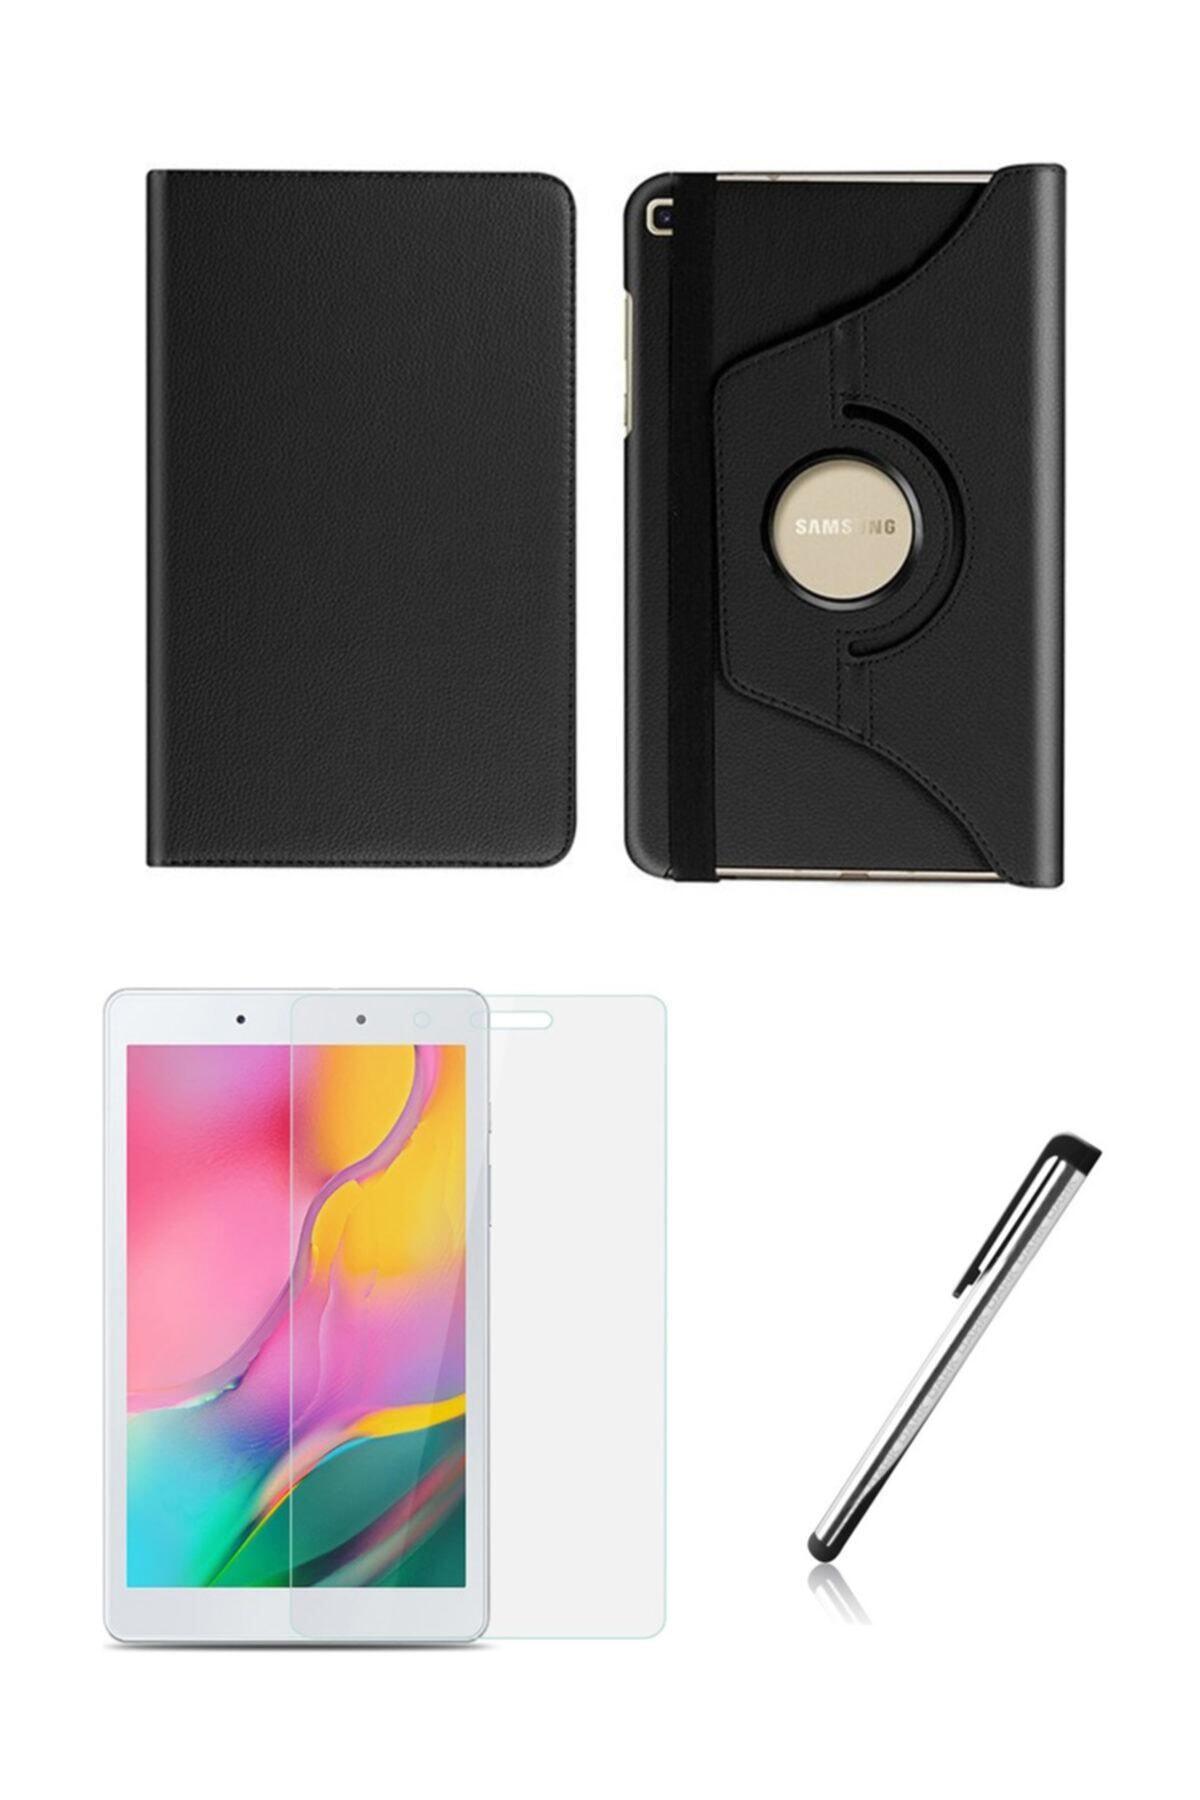 Esepetim Samsung Galaxy Tab A Sm-t290 Dönerli Tablet Kılıfı Seti 8 Inç Siyah 1